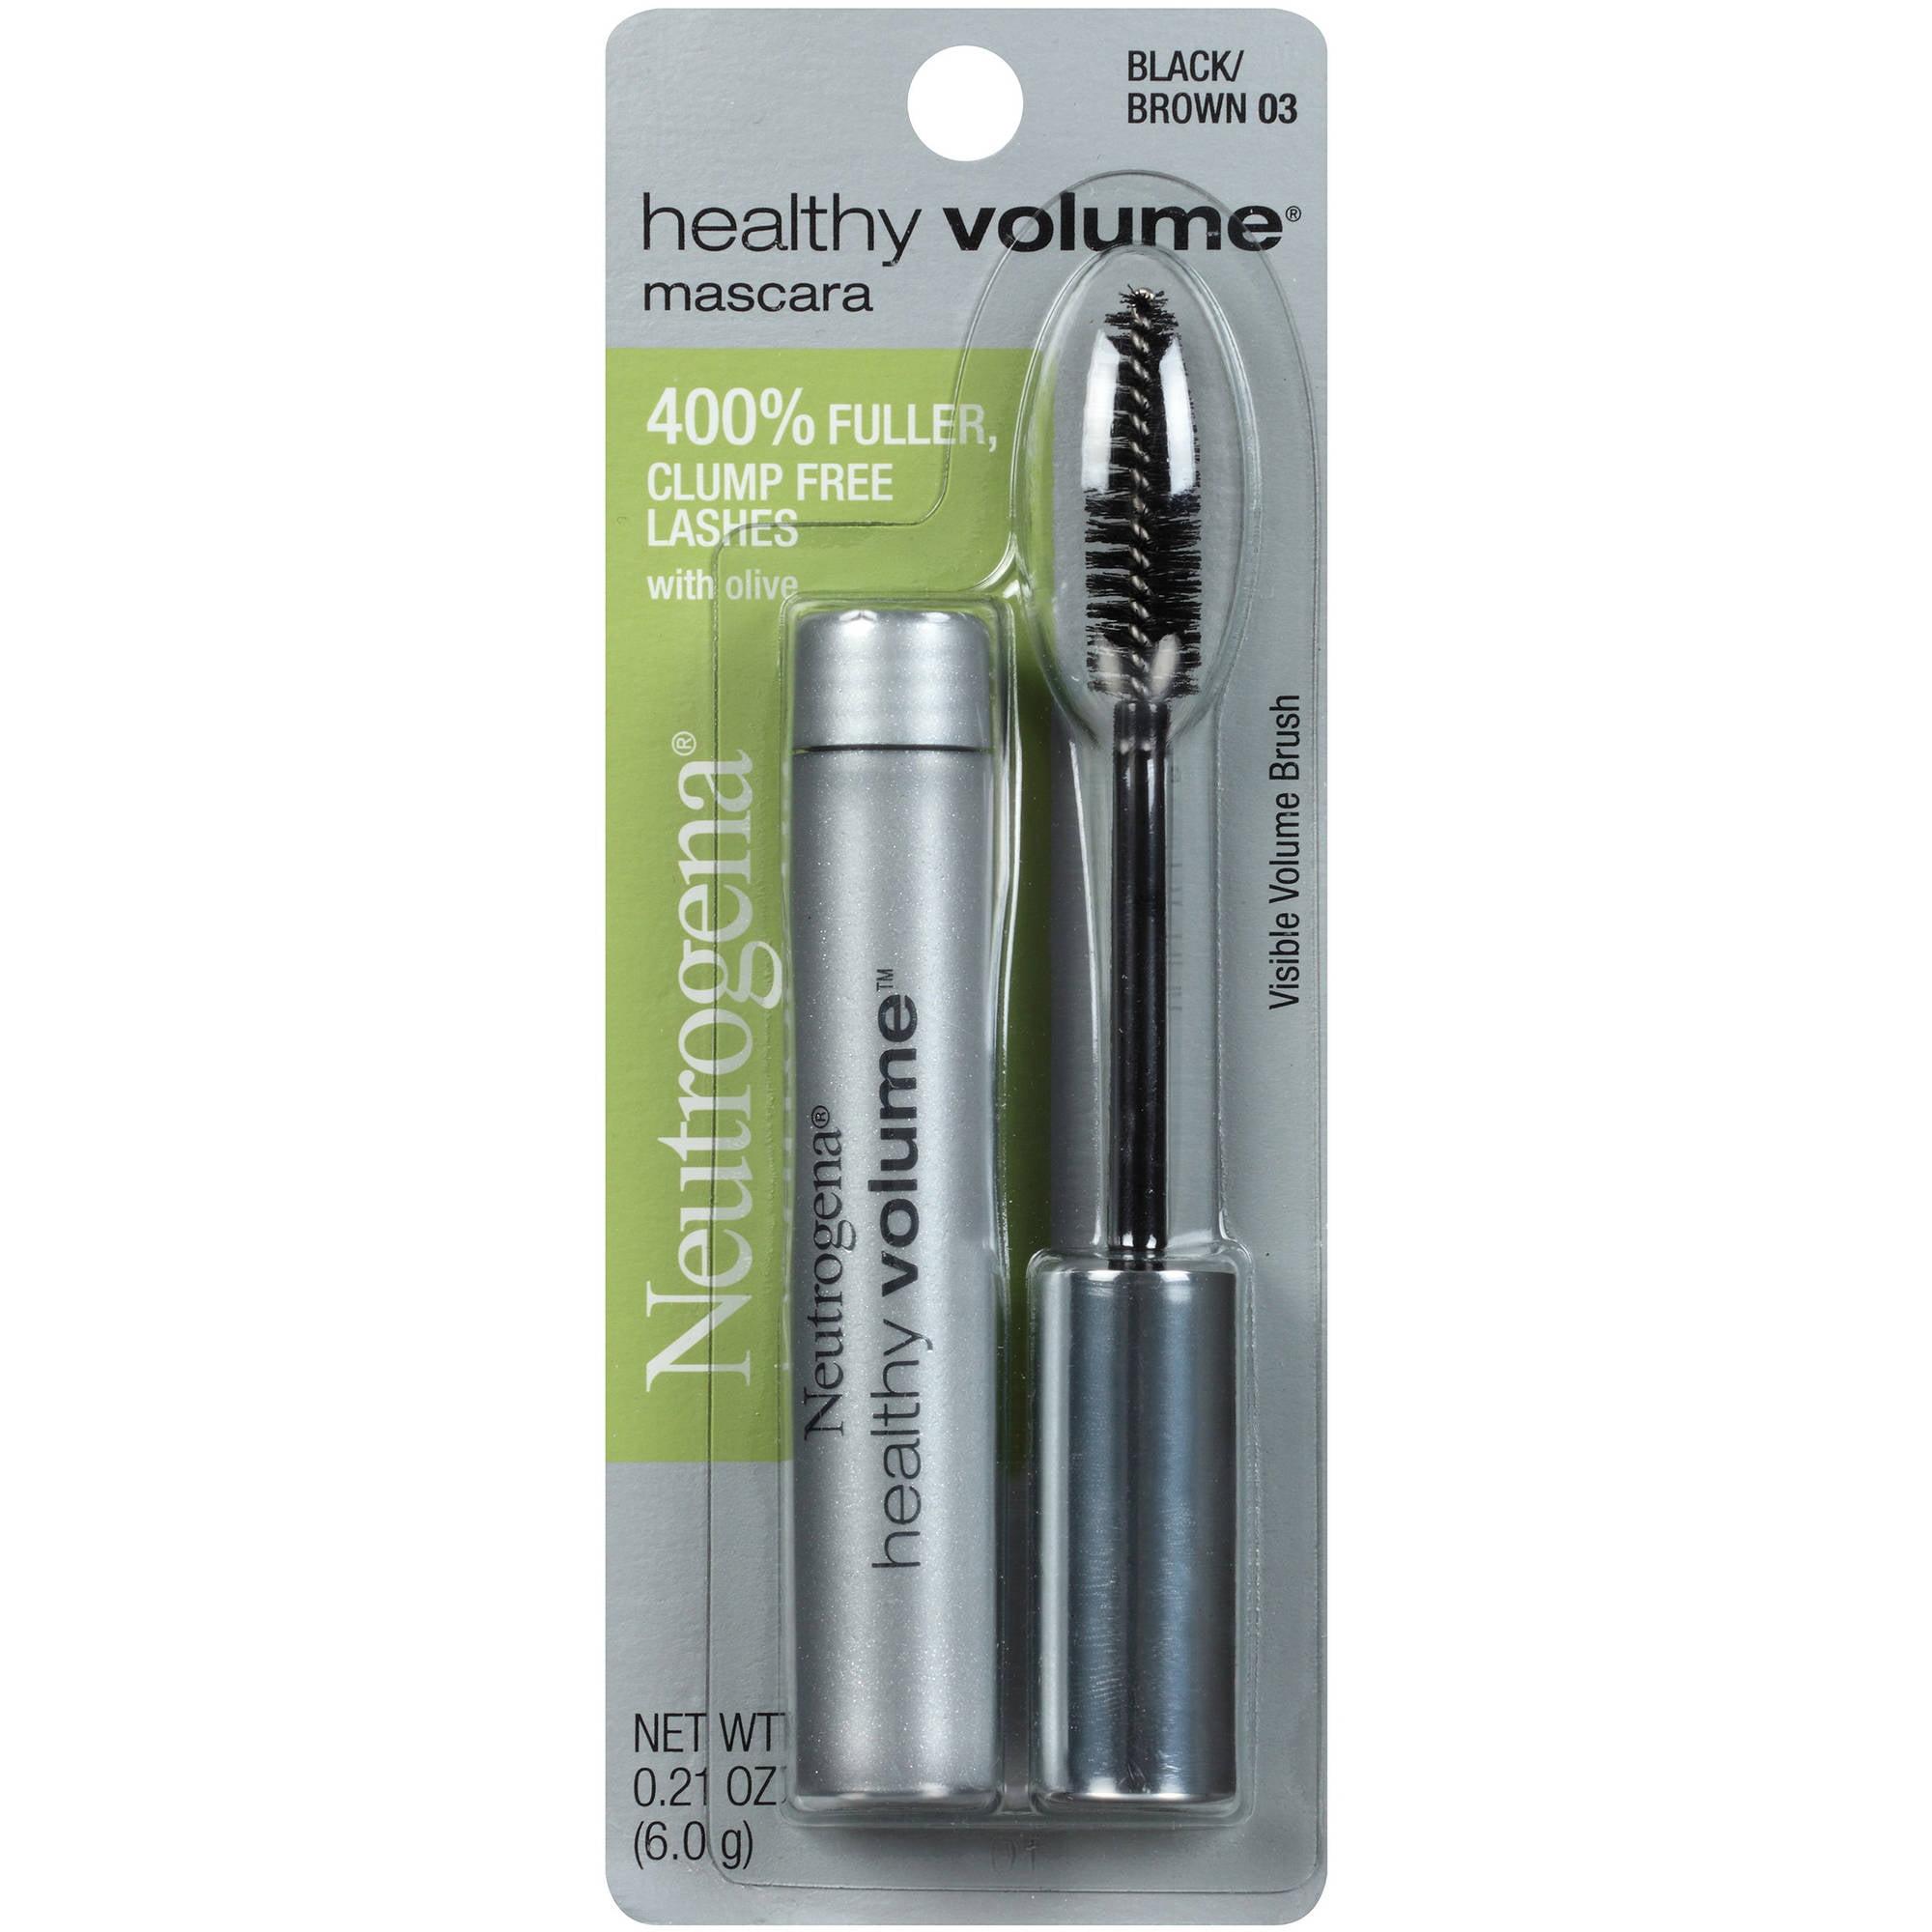 Neutrogena Healthy Volume Mascara, Black/Brown 03, 0.21 oz